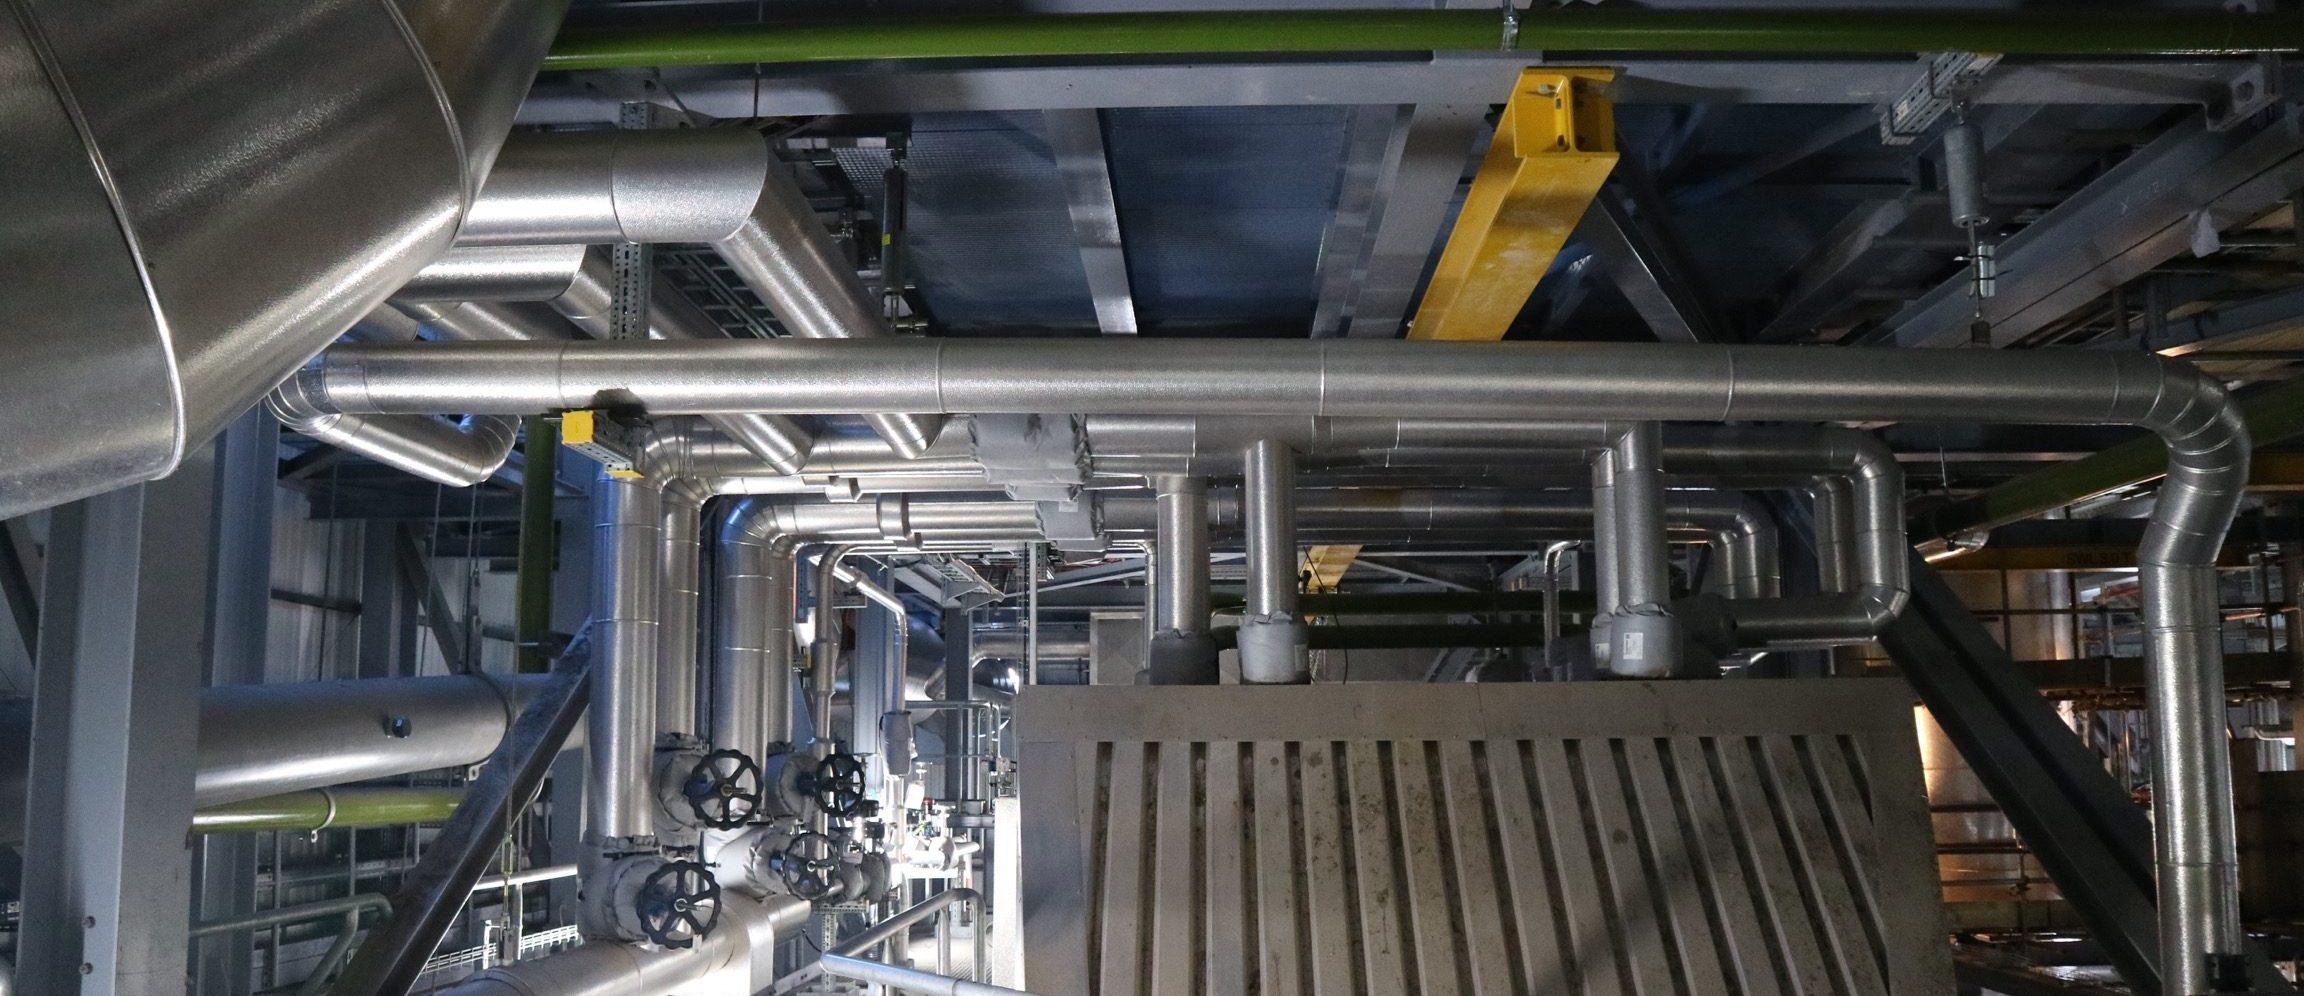 Thermal Insulation, Pipework, Boiler